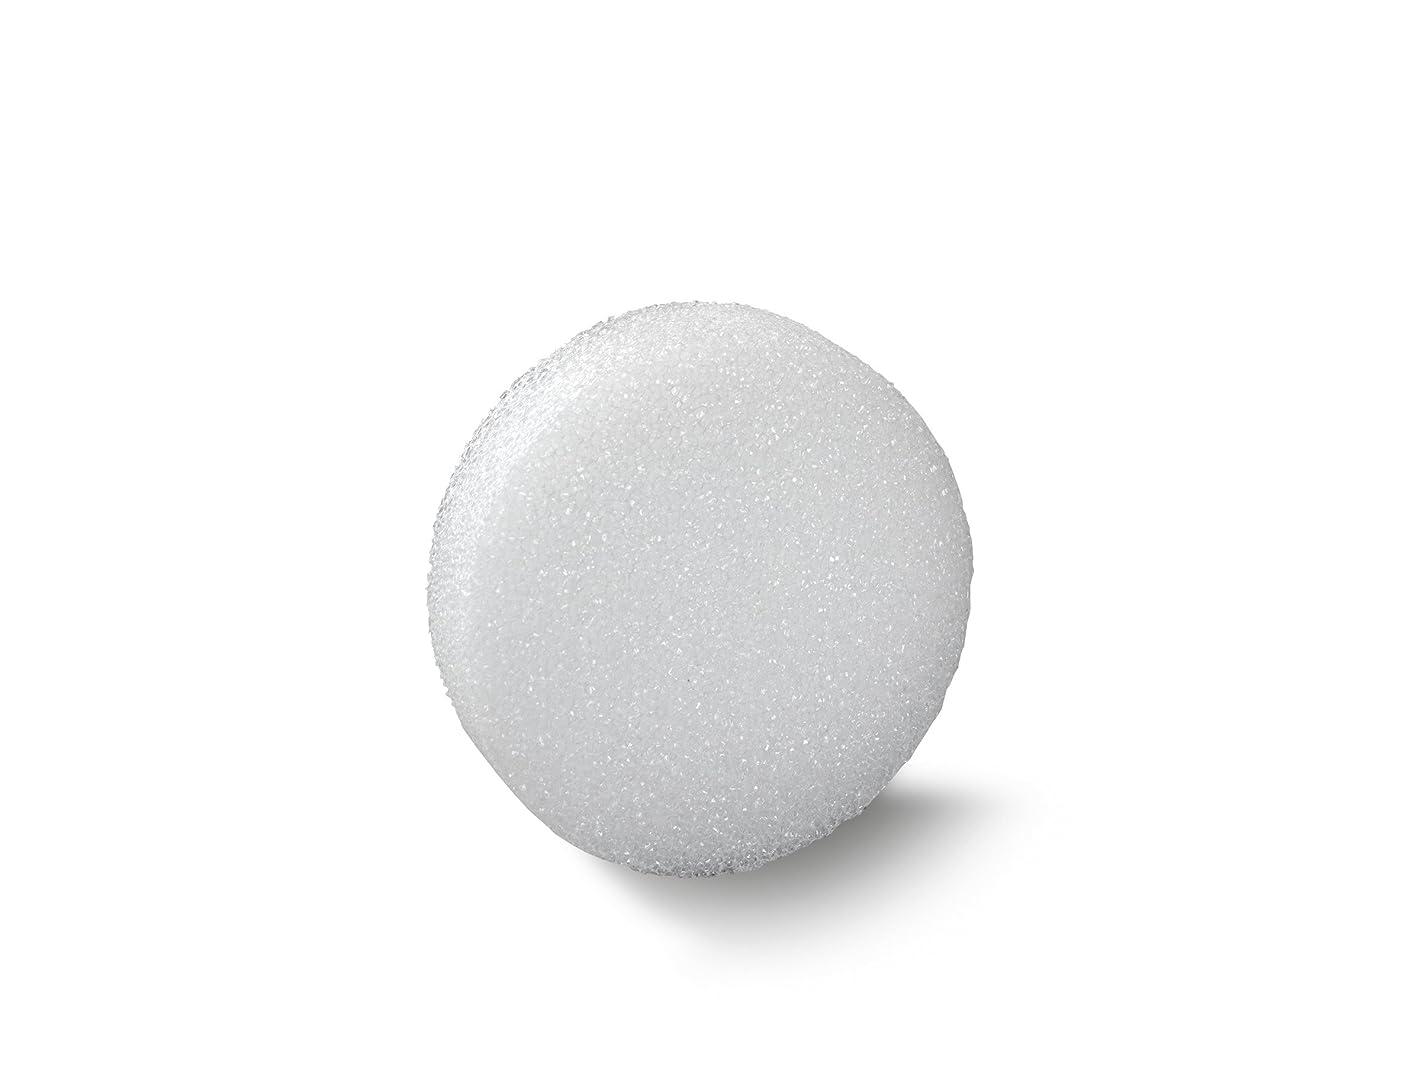 FloraCraft Styrofoam Disc 0.9 Inch x 5.8 Inch White